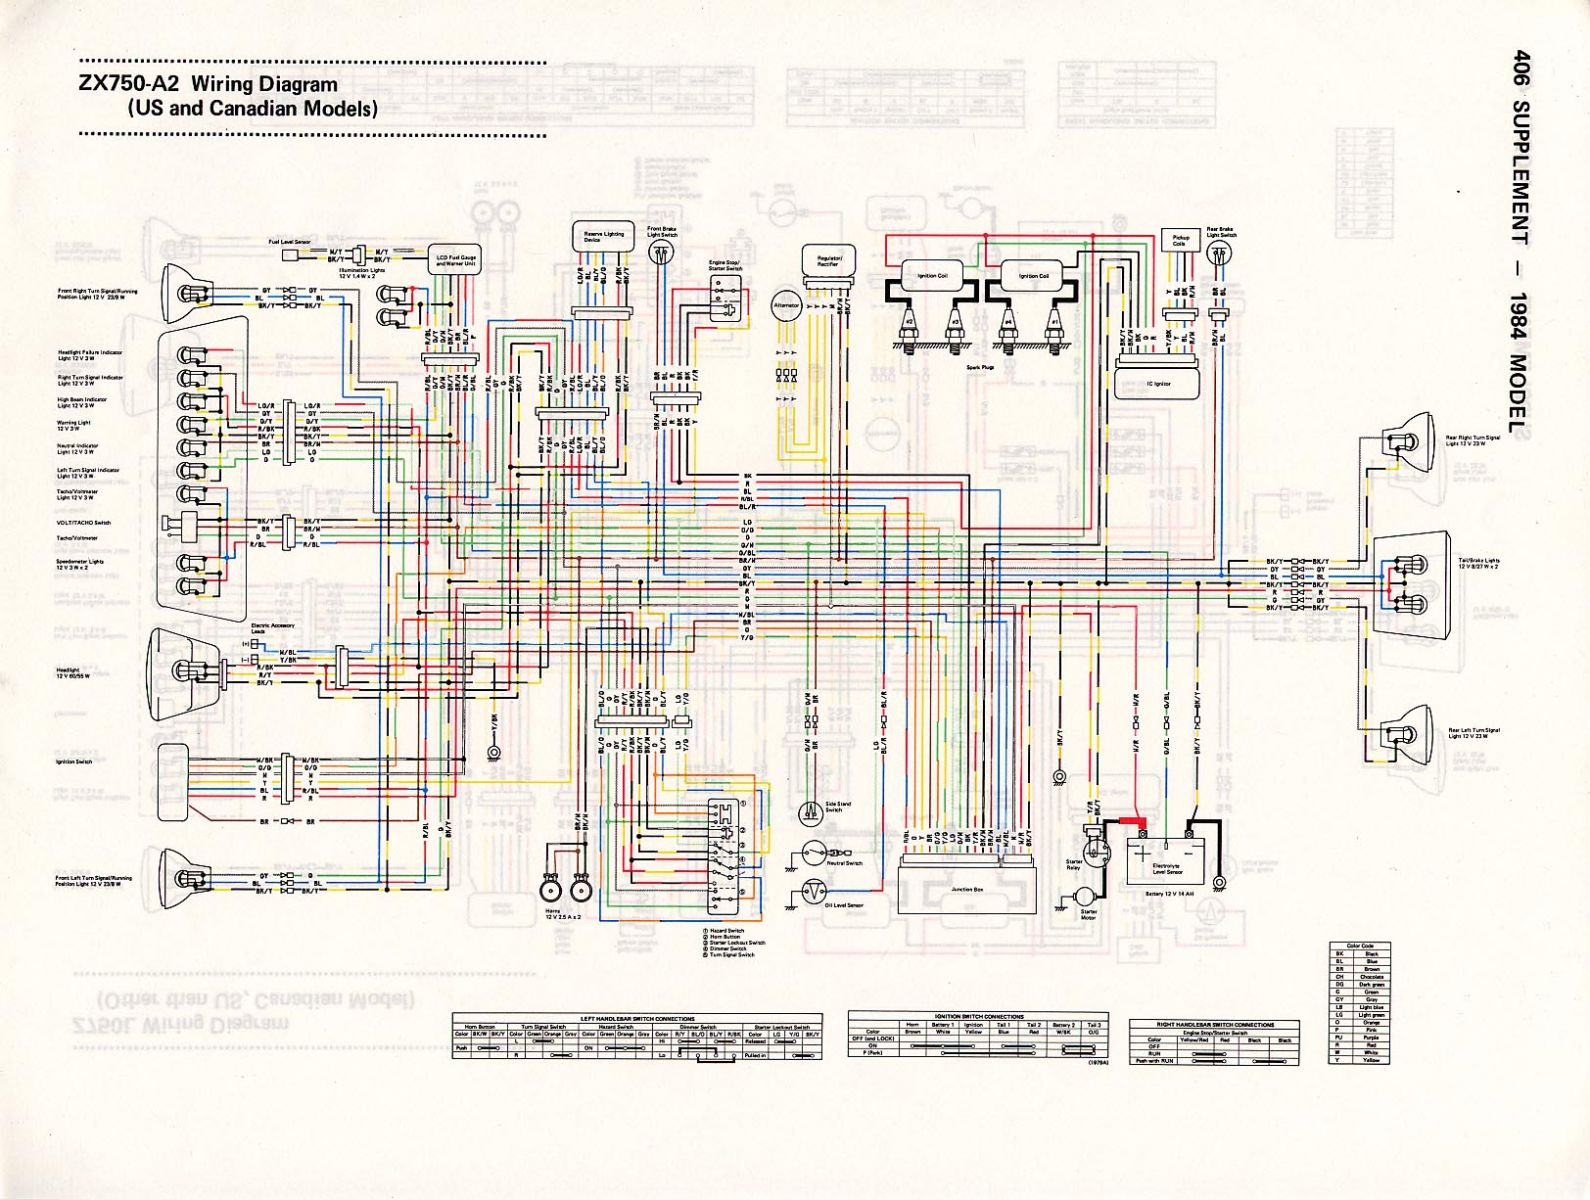 Kz750 H1 Wiring Diagram | Wiring Diagram on kz440 wiring diagram, er6n wiring diagram, klr650 wiring diagram, kz1000 wiring diagram, kl600 wiring diagram, zg1000 wiring diagram, klr250 wiring diagram, zx10 wiring diagram, h1 wiring diagram, kz1300 wiring diagram, ex250 wiring diagram, kawasaki wiring diagram, z400 wiring diagram, zx1000 wiring diagram, ninja 250r wiring diagram, gs550 wiring diagram, zl900 eliminator wiring diagram, z1000 wiring diagram, z1 wiring diagram, gs750 wiring diagram,